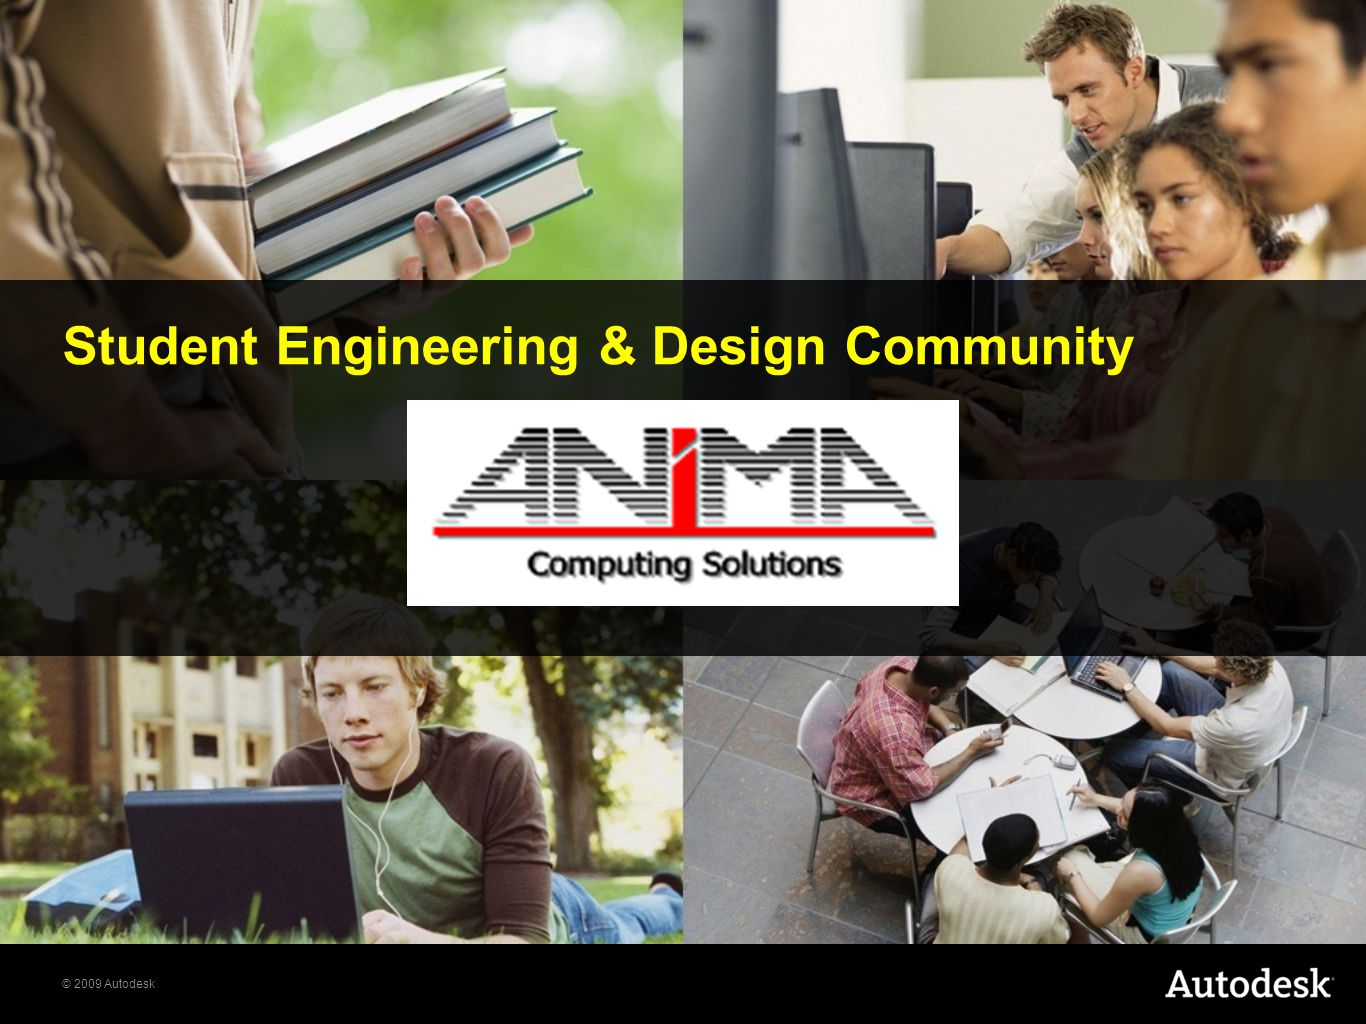 © 2009 Autodesk Διερευνήστε επαγγελματικές προοπτικές